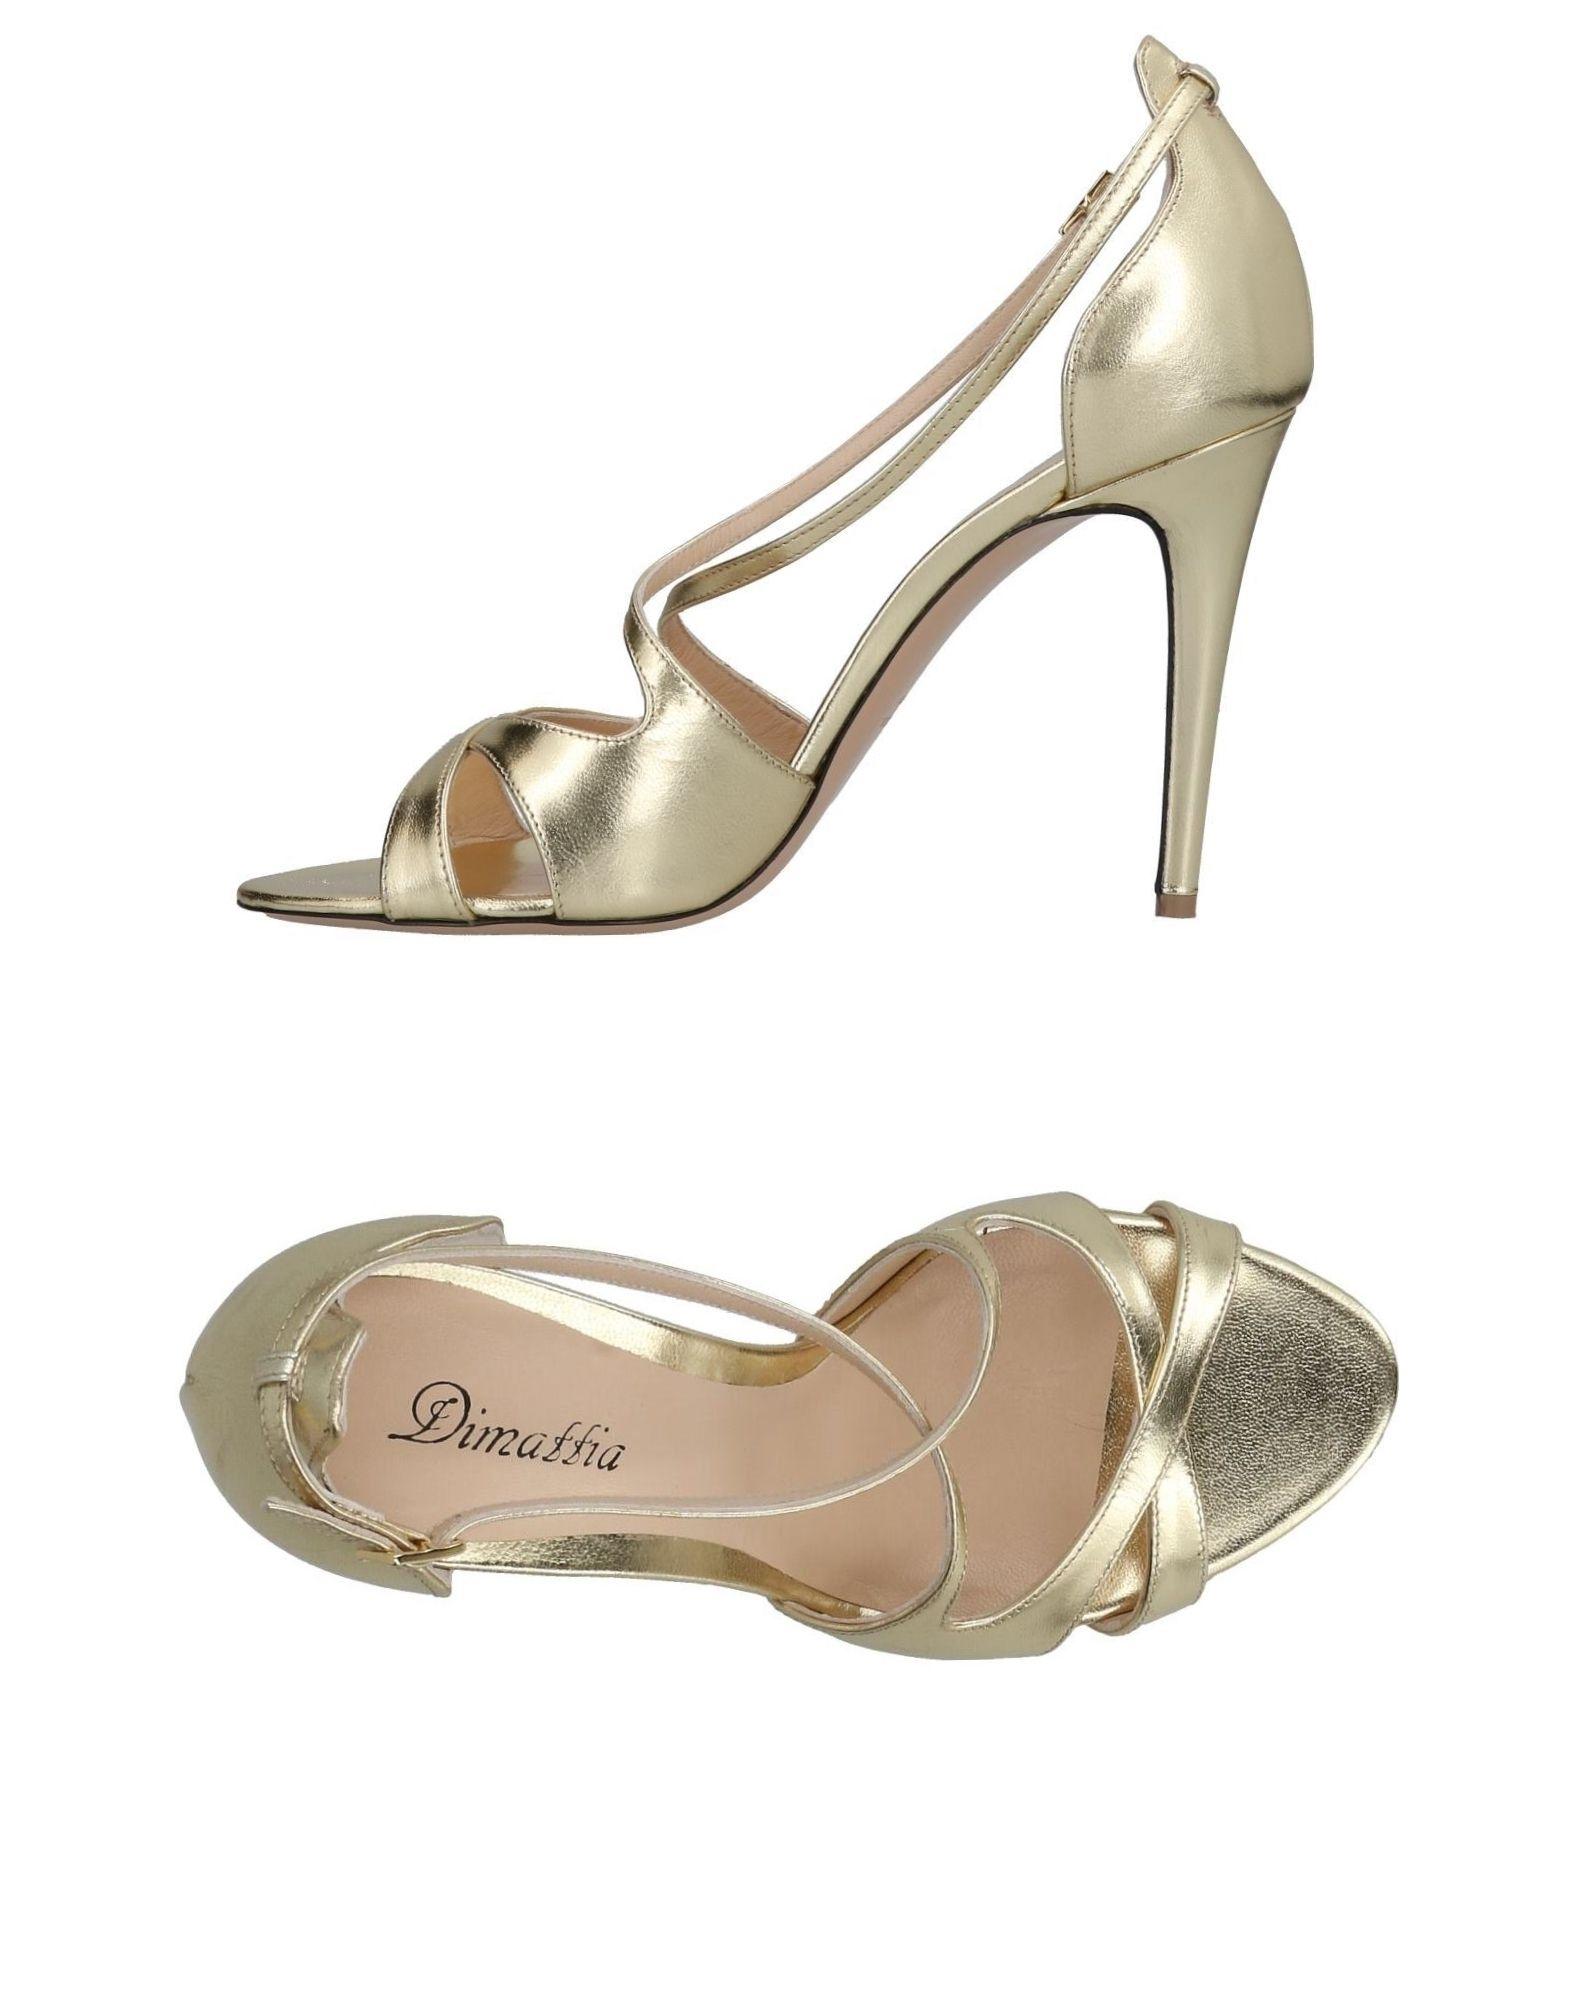 Dimattia Sandalen Damen 11419499VQ Gute Qualität beliebte Schuhe